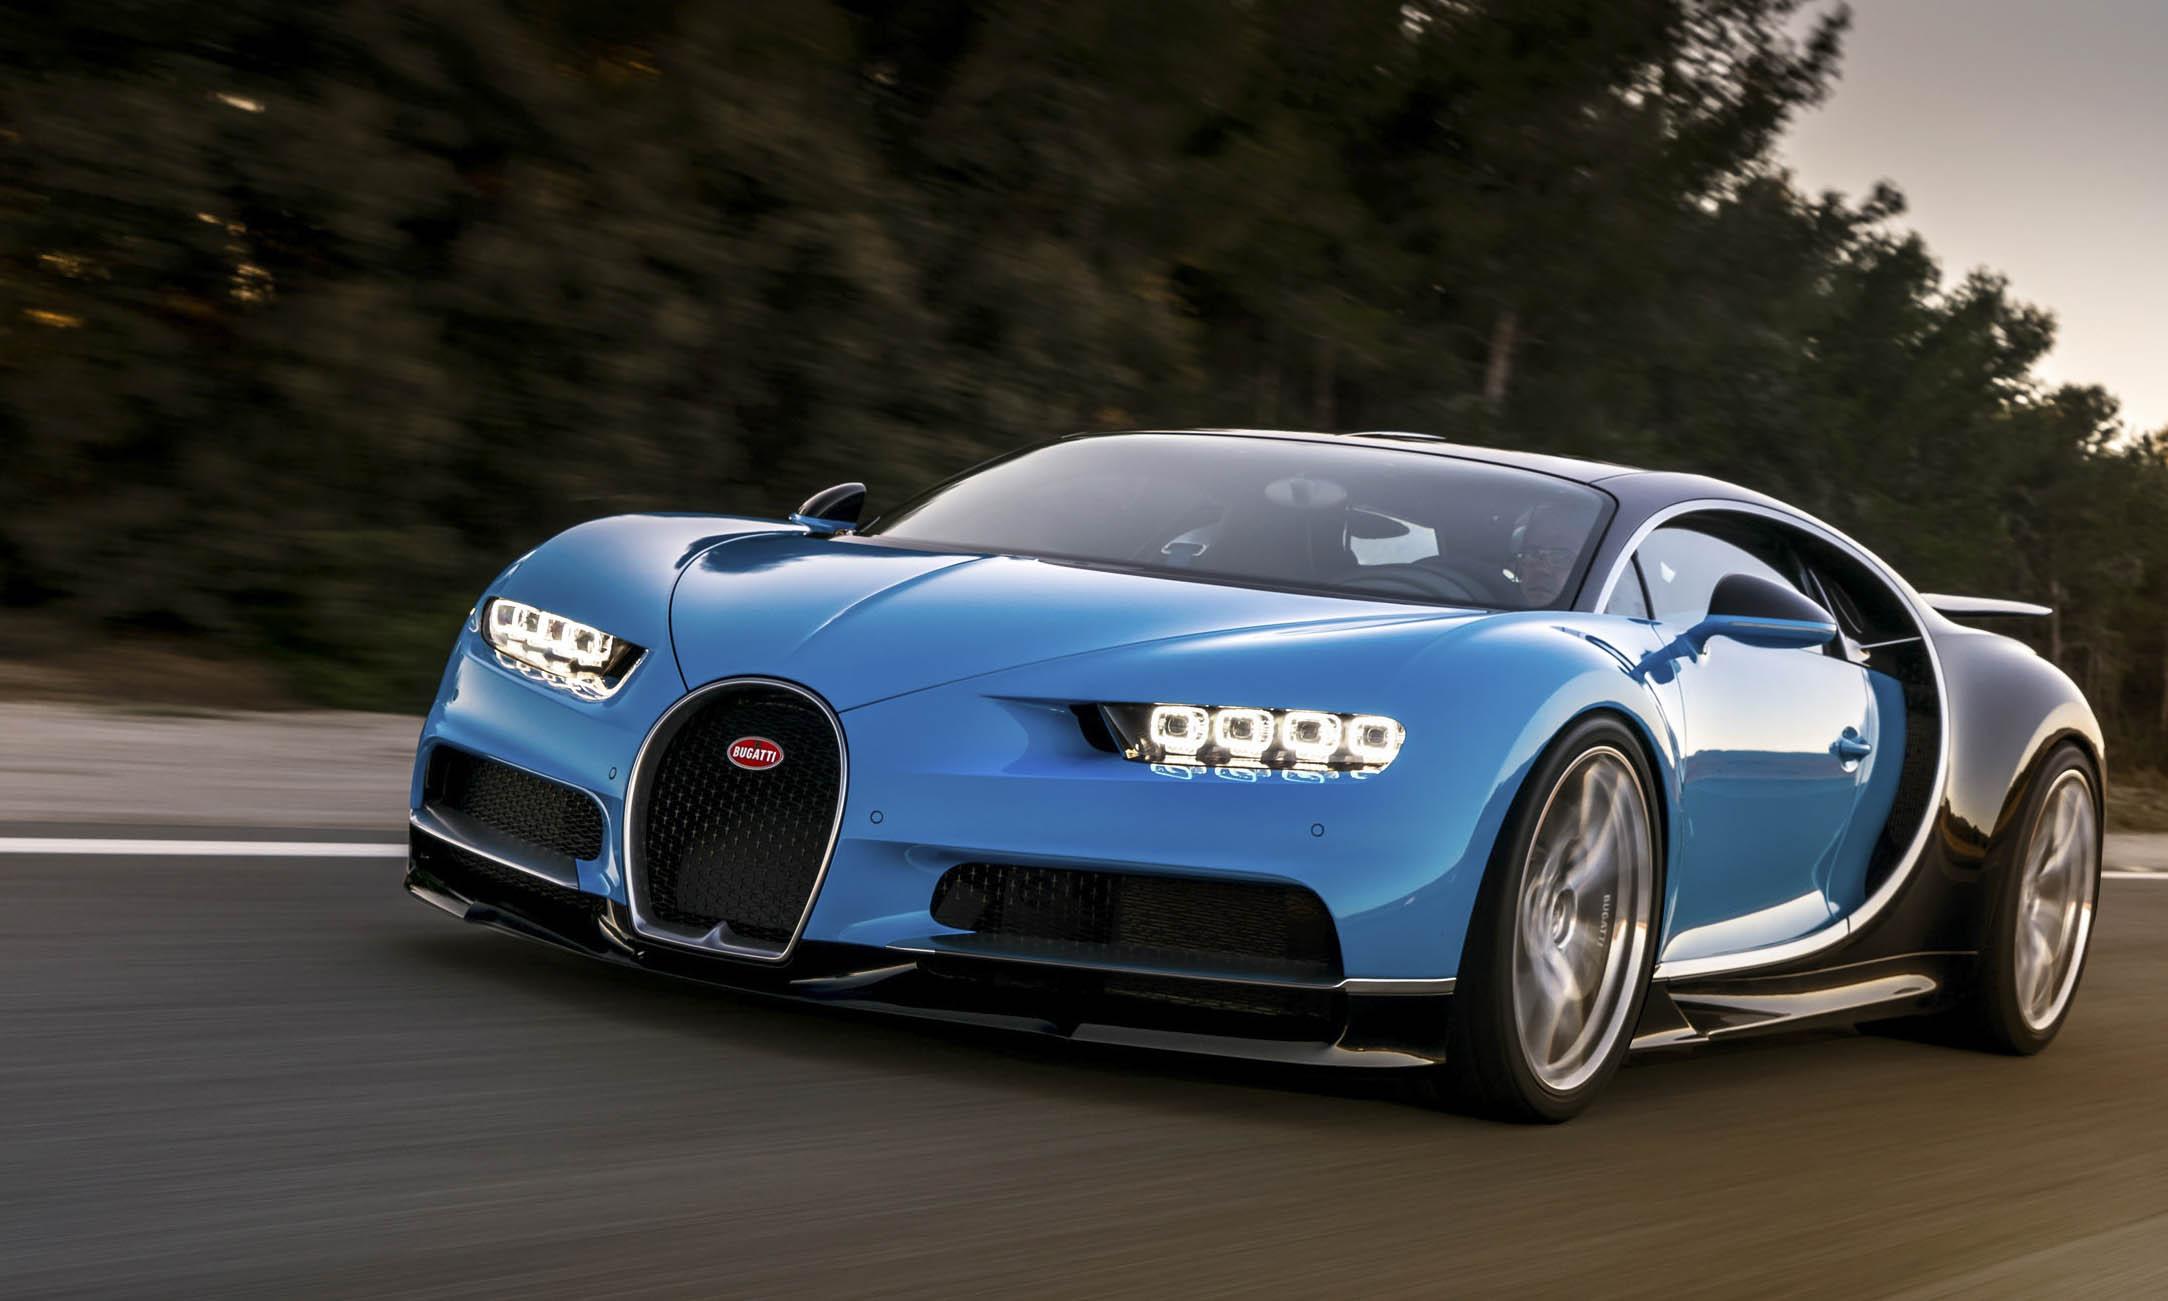 2016 geneva motor show: bugatti chiron first look - » autonxt